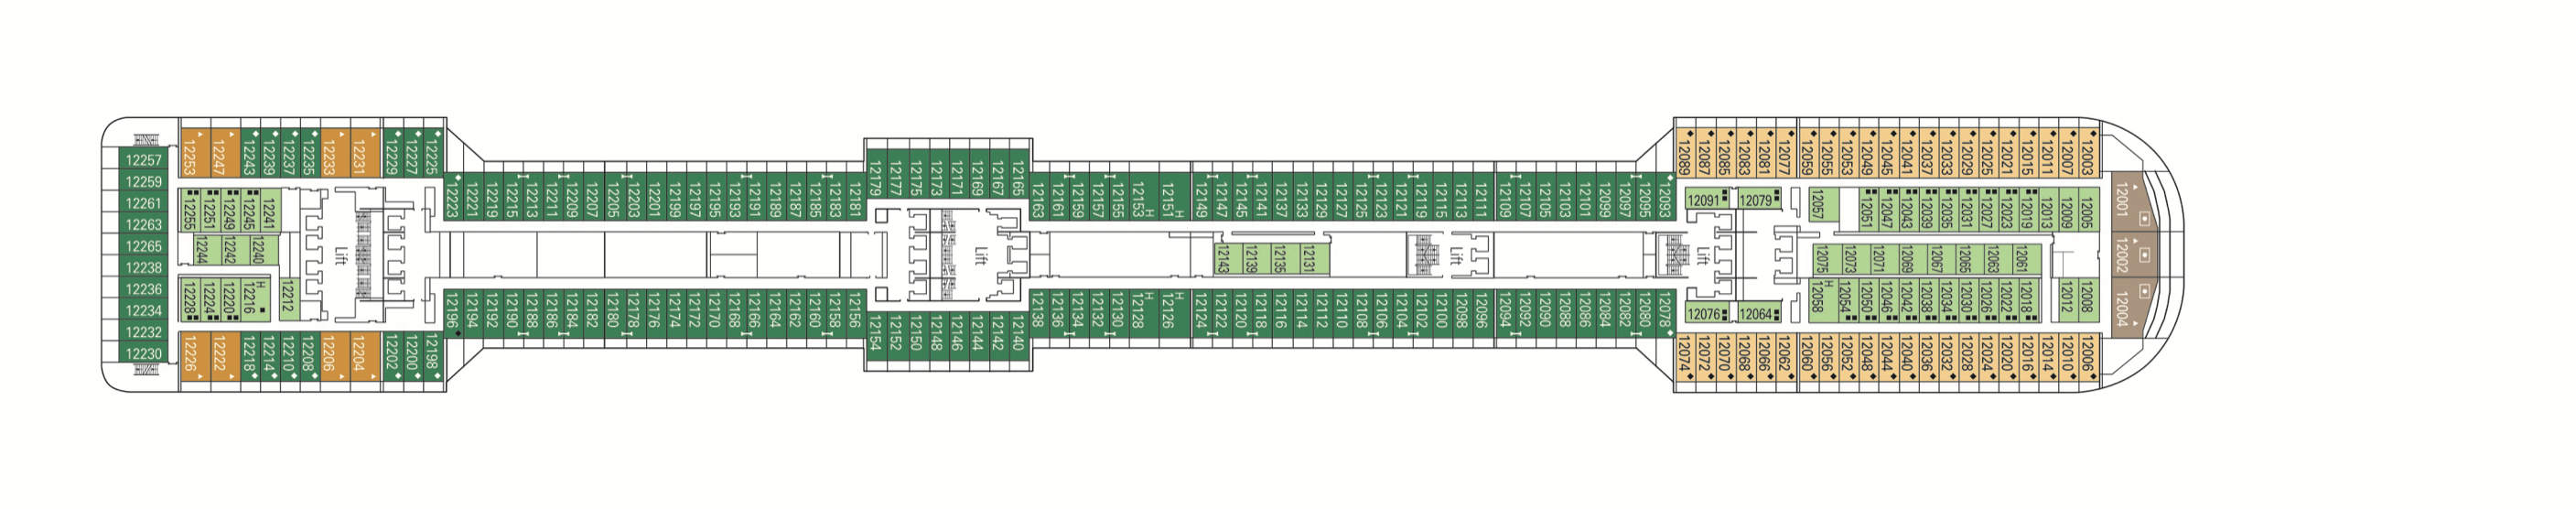 MSC Fantasia Class Splendida Deck 12.jpg